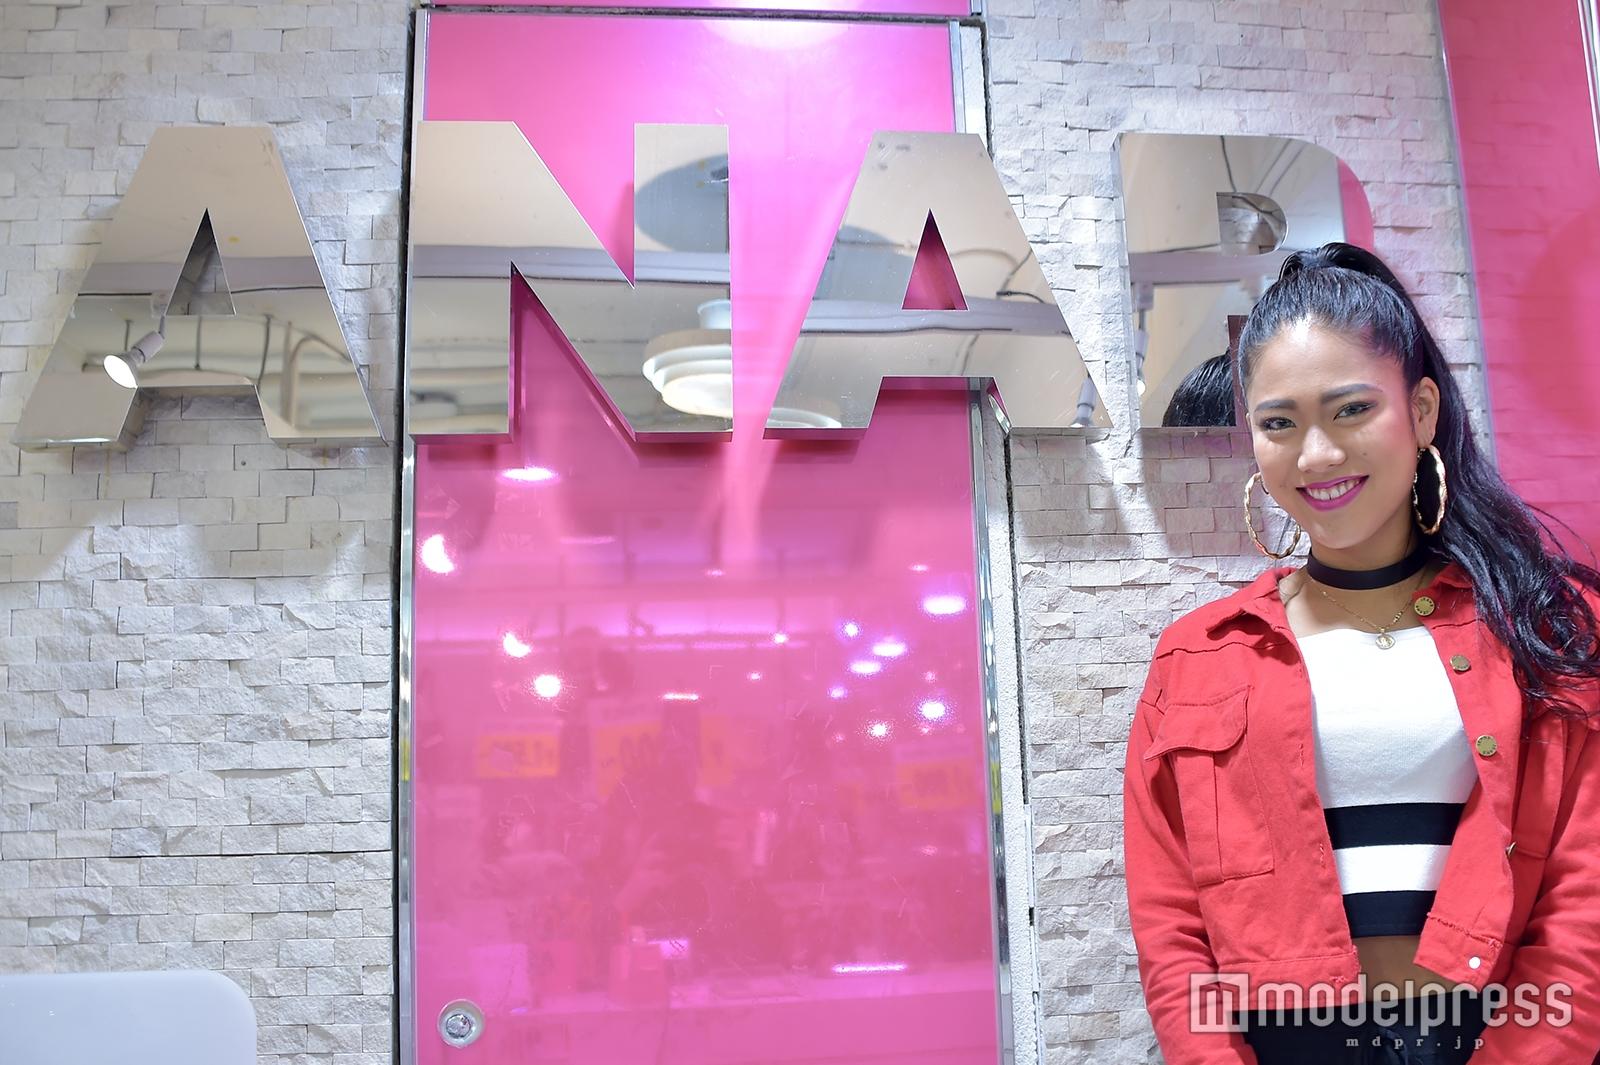 「ANAP」原宿竹下通り店店長の嶋野加苗さん(C)モデルプレス